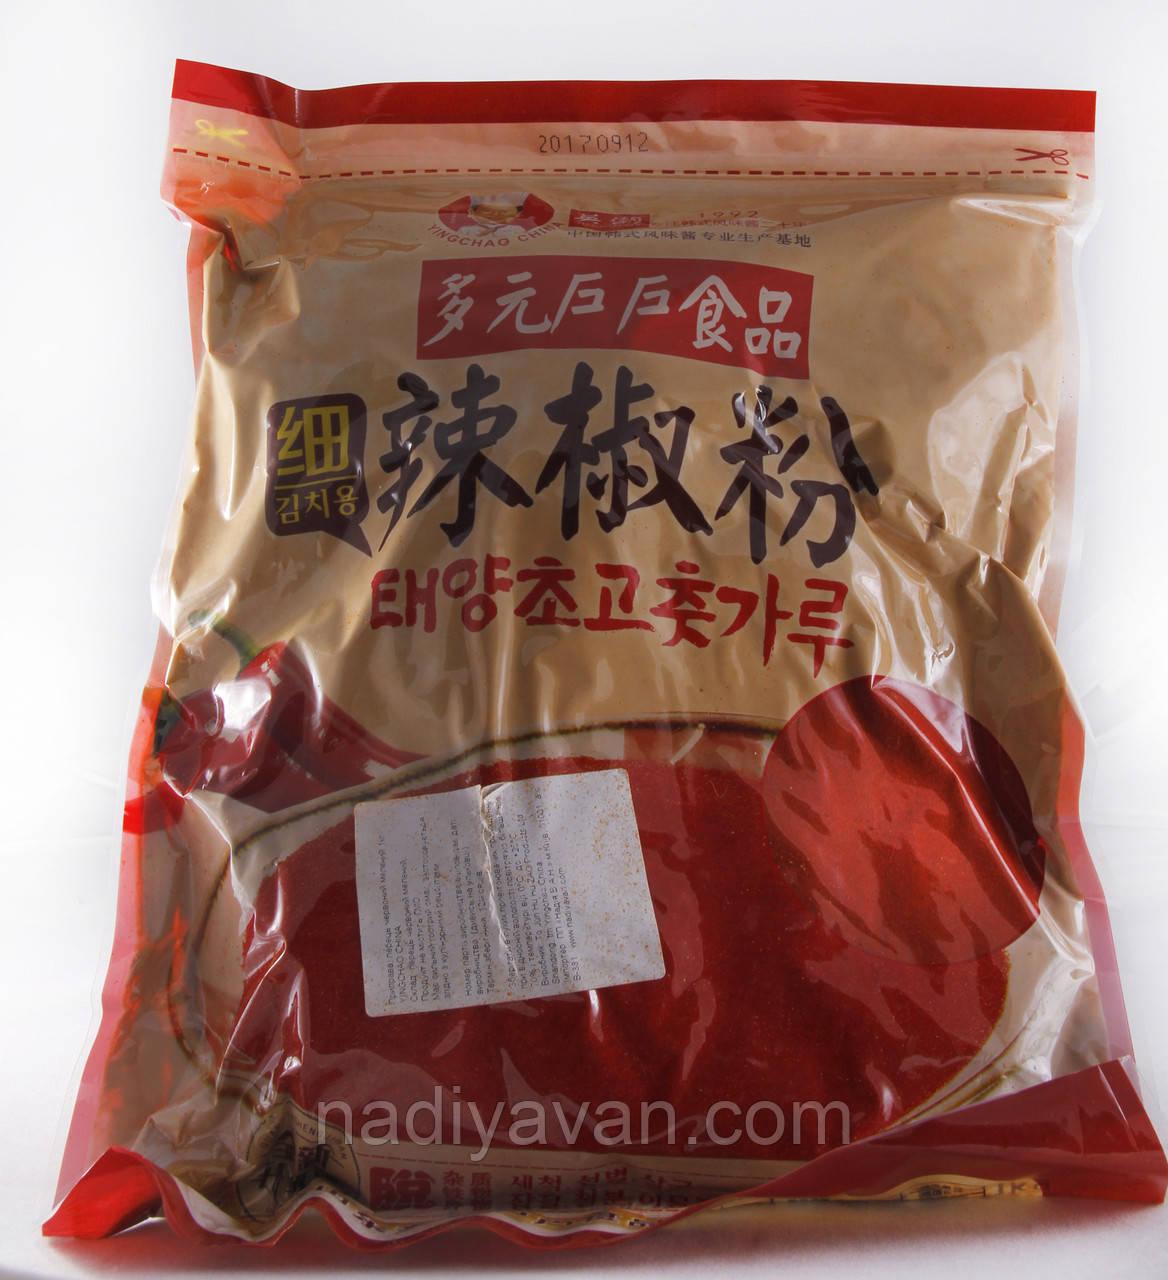 Кочукару: Красный перец кимчи 1кг tm YINGCHAO